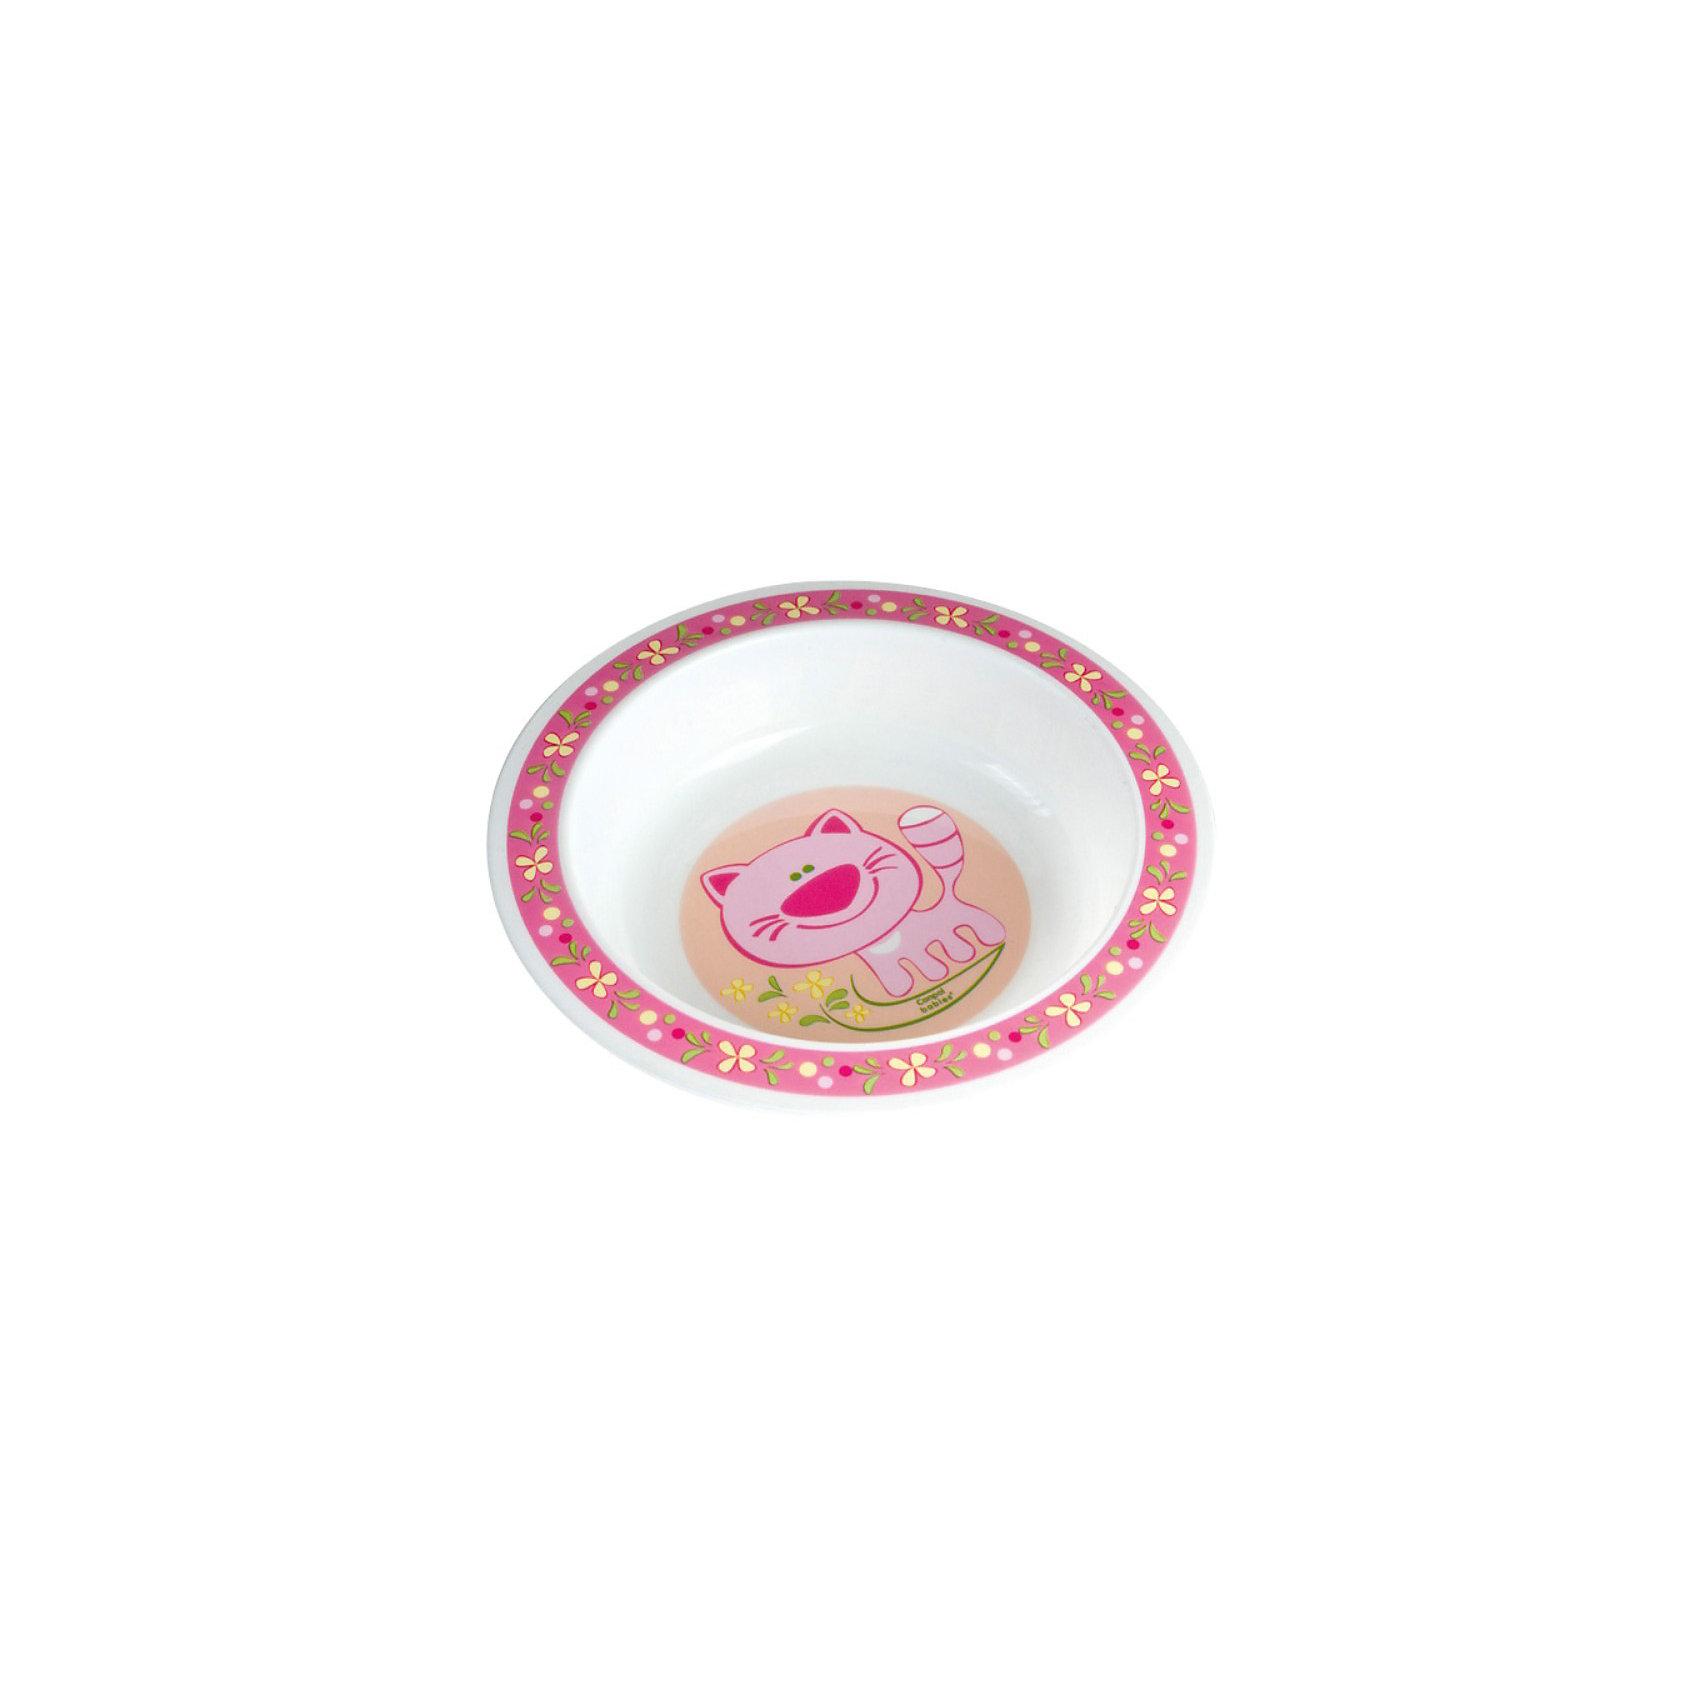 Canpol Babies Тарелка Котёнок, 270 мл.,Canpol Babies, розовый canpol babies коврик развивающий цветной океан